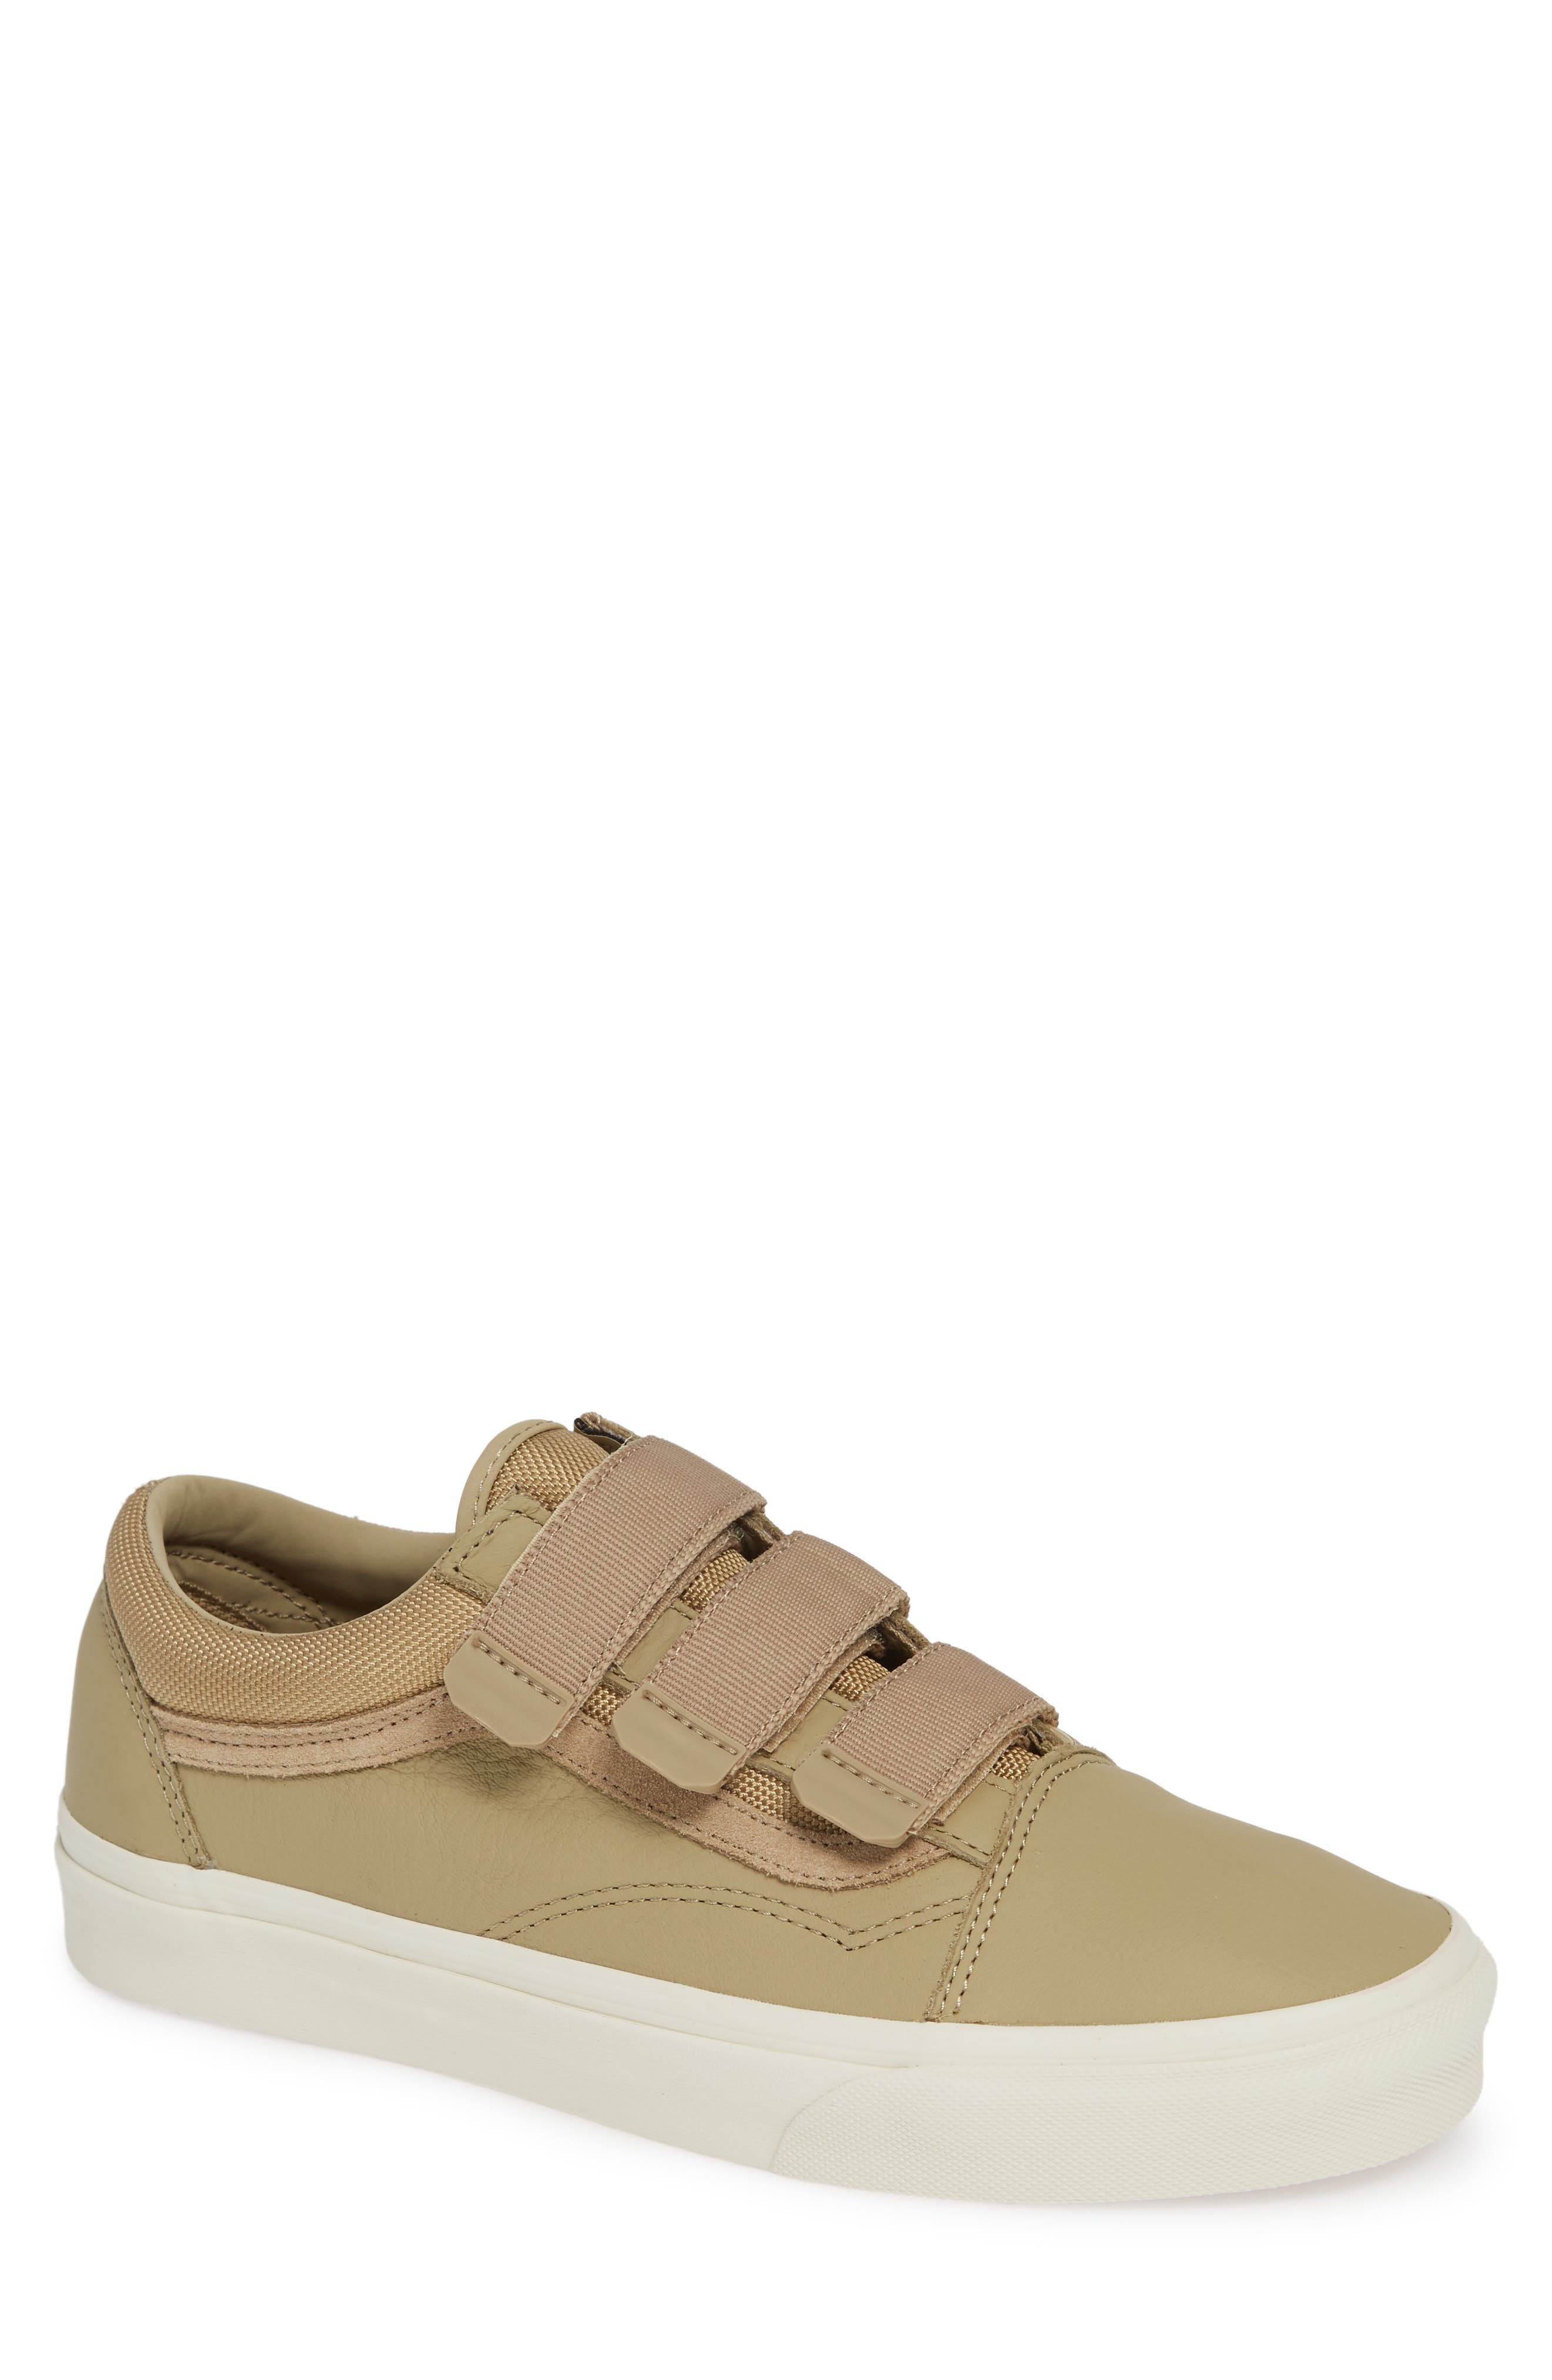 Old Skool V Sneaker,                             Main thumbnail 1, color,                             260